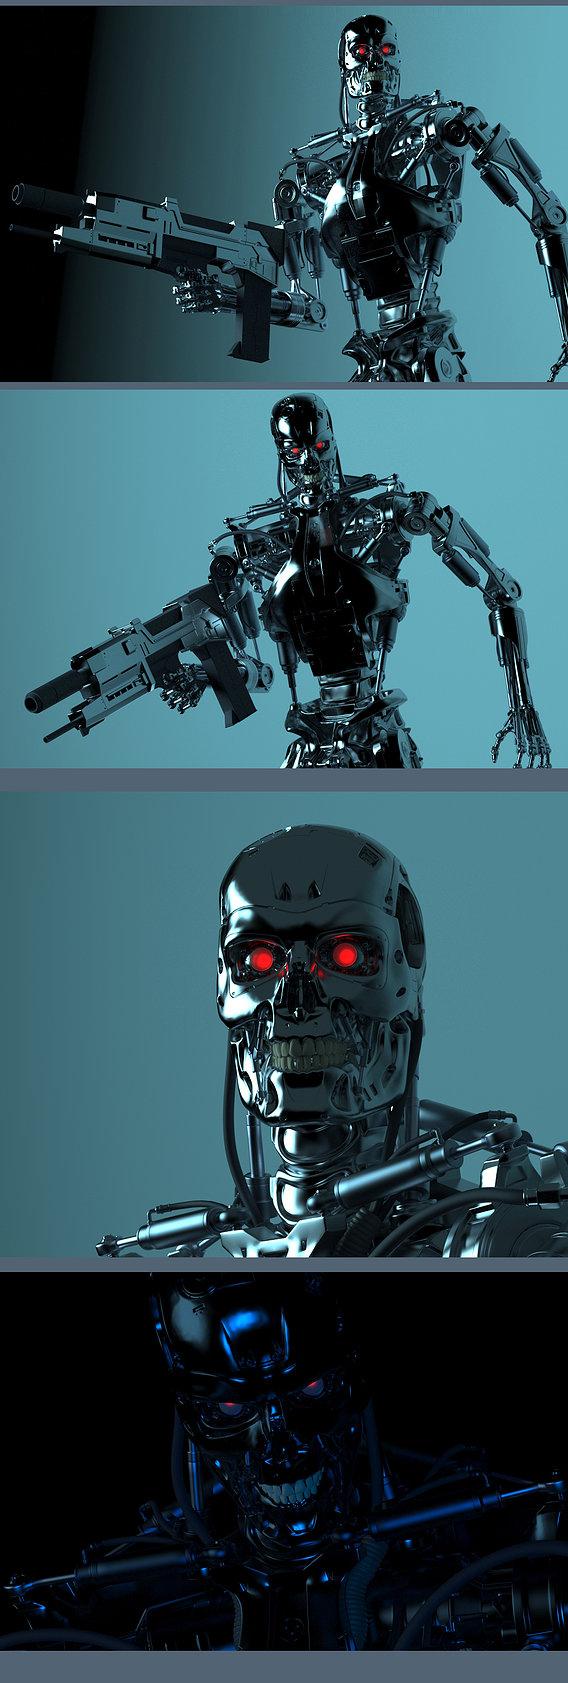 Creation terminator t-800 real model #16